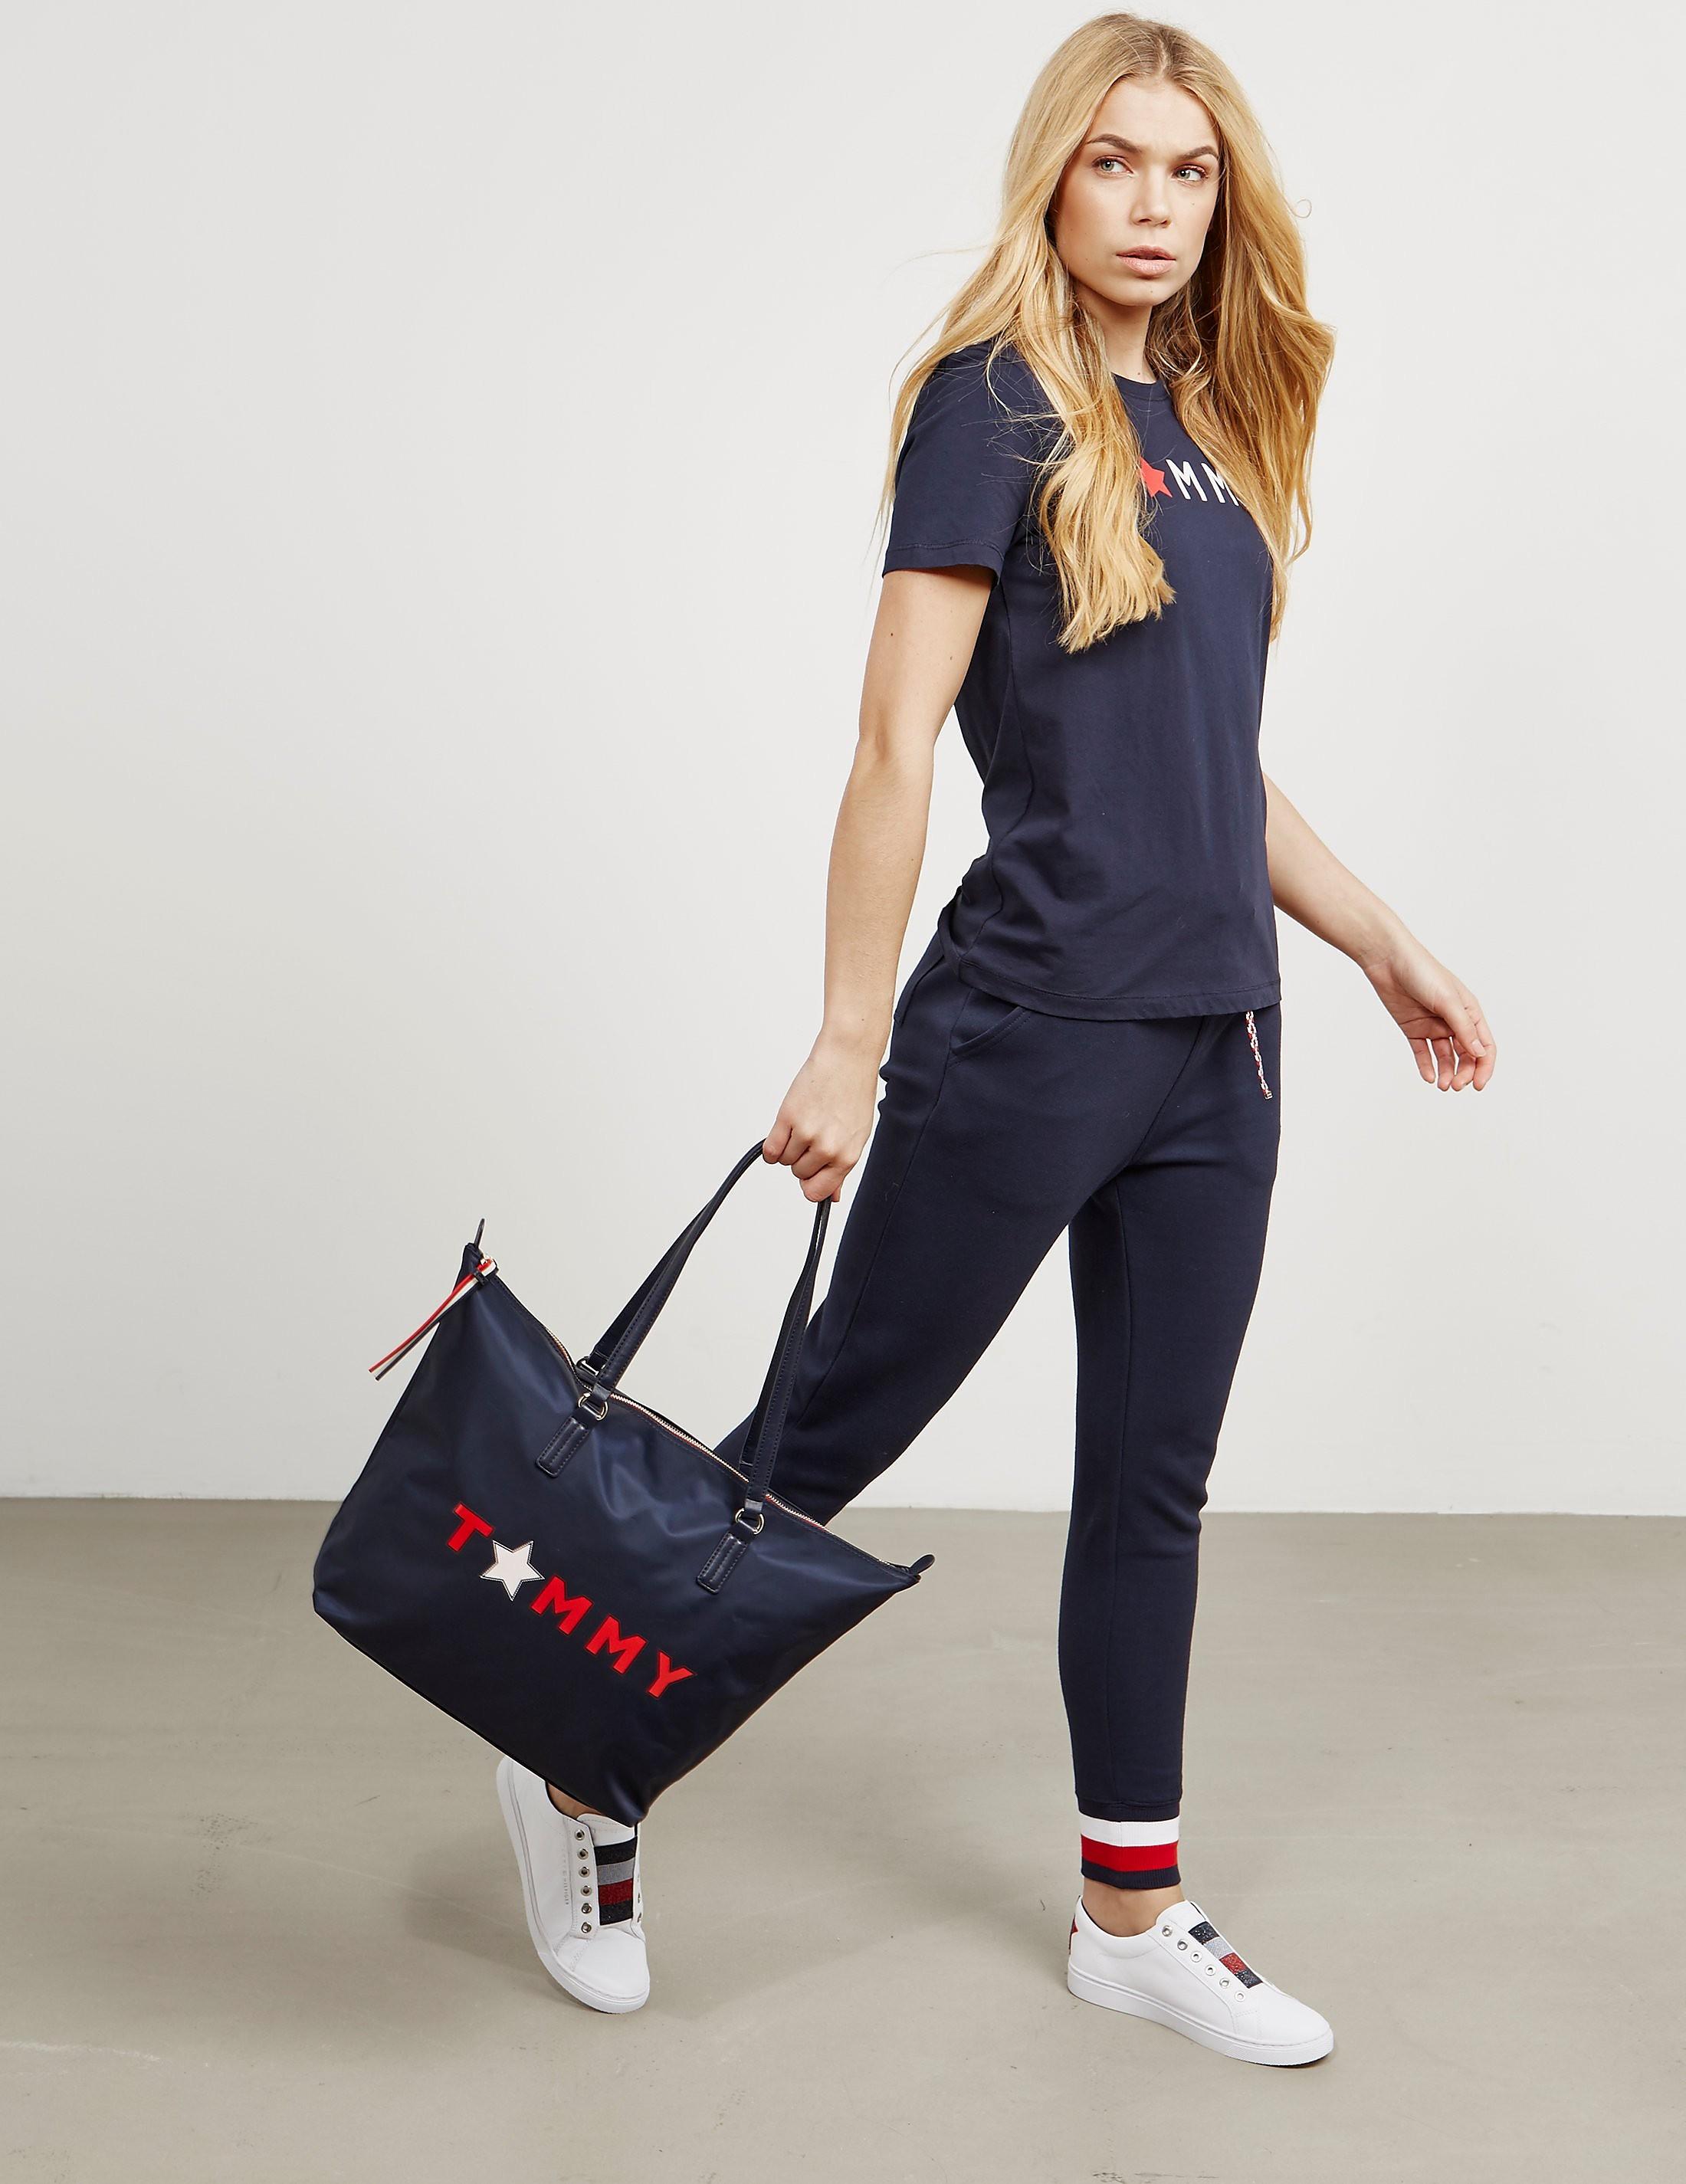 Tommy Hilfiger Poppy Star Tote Bag